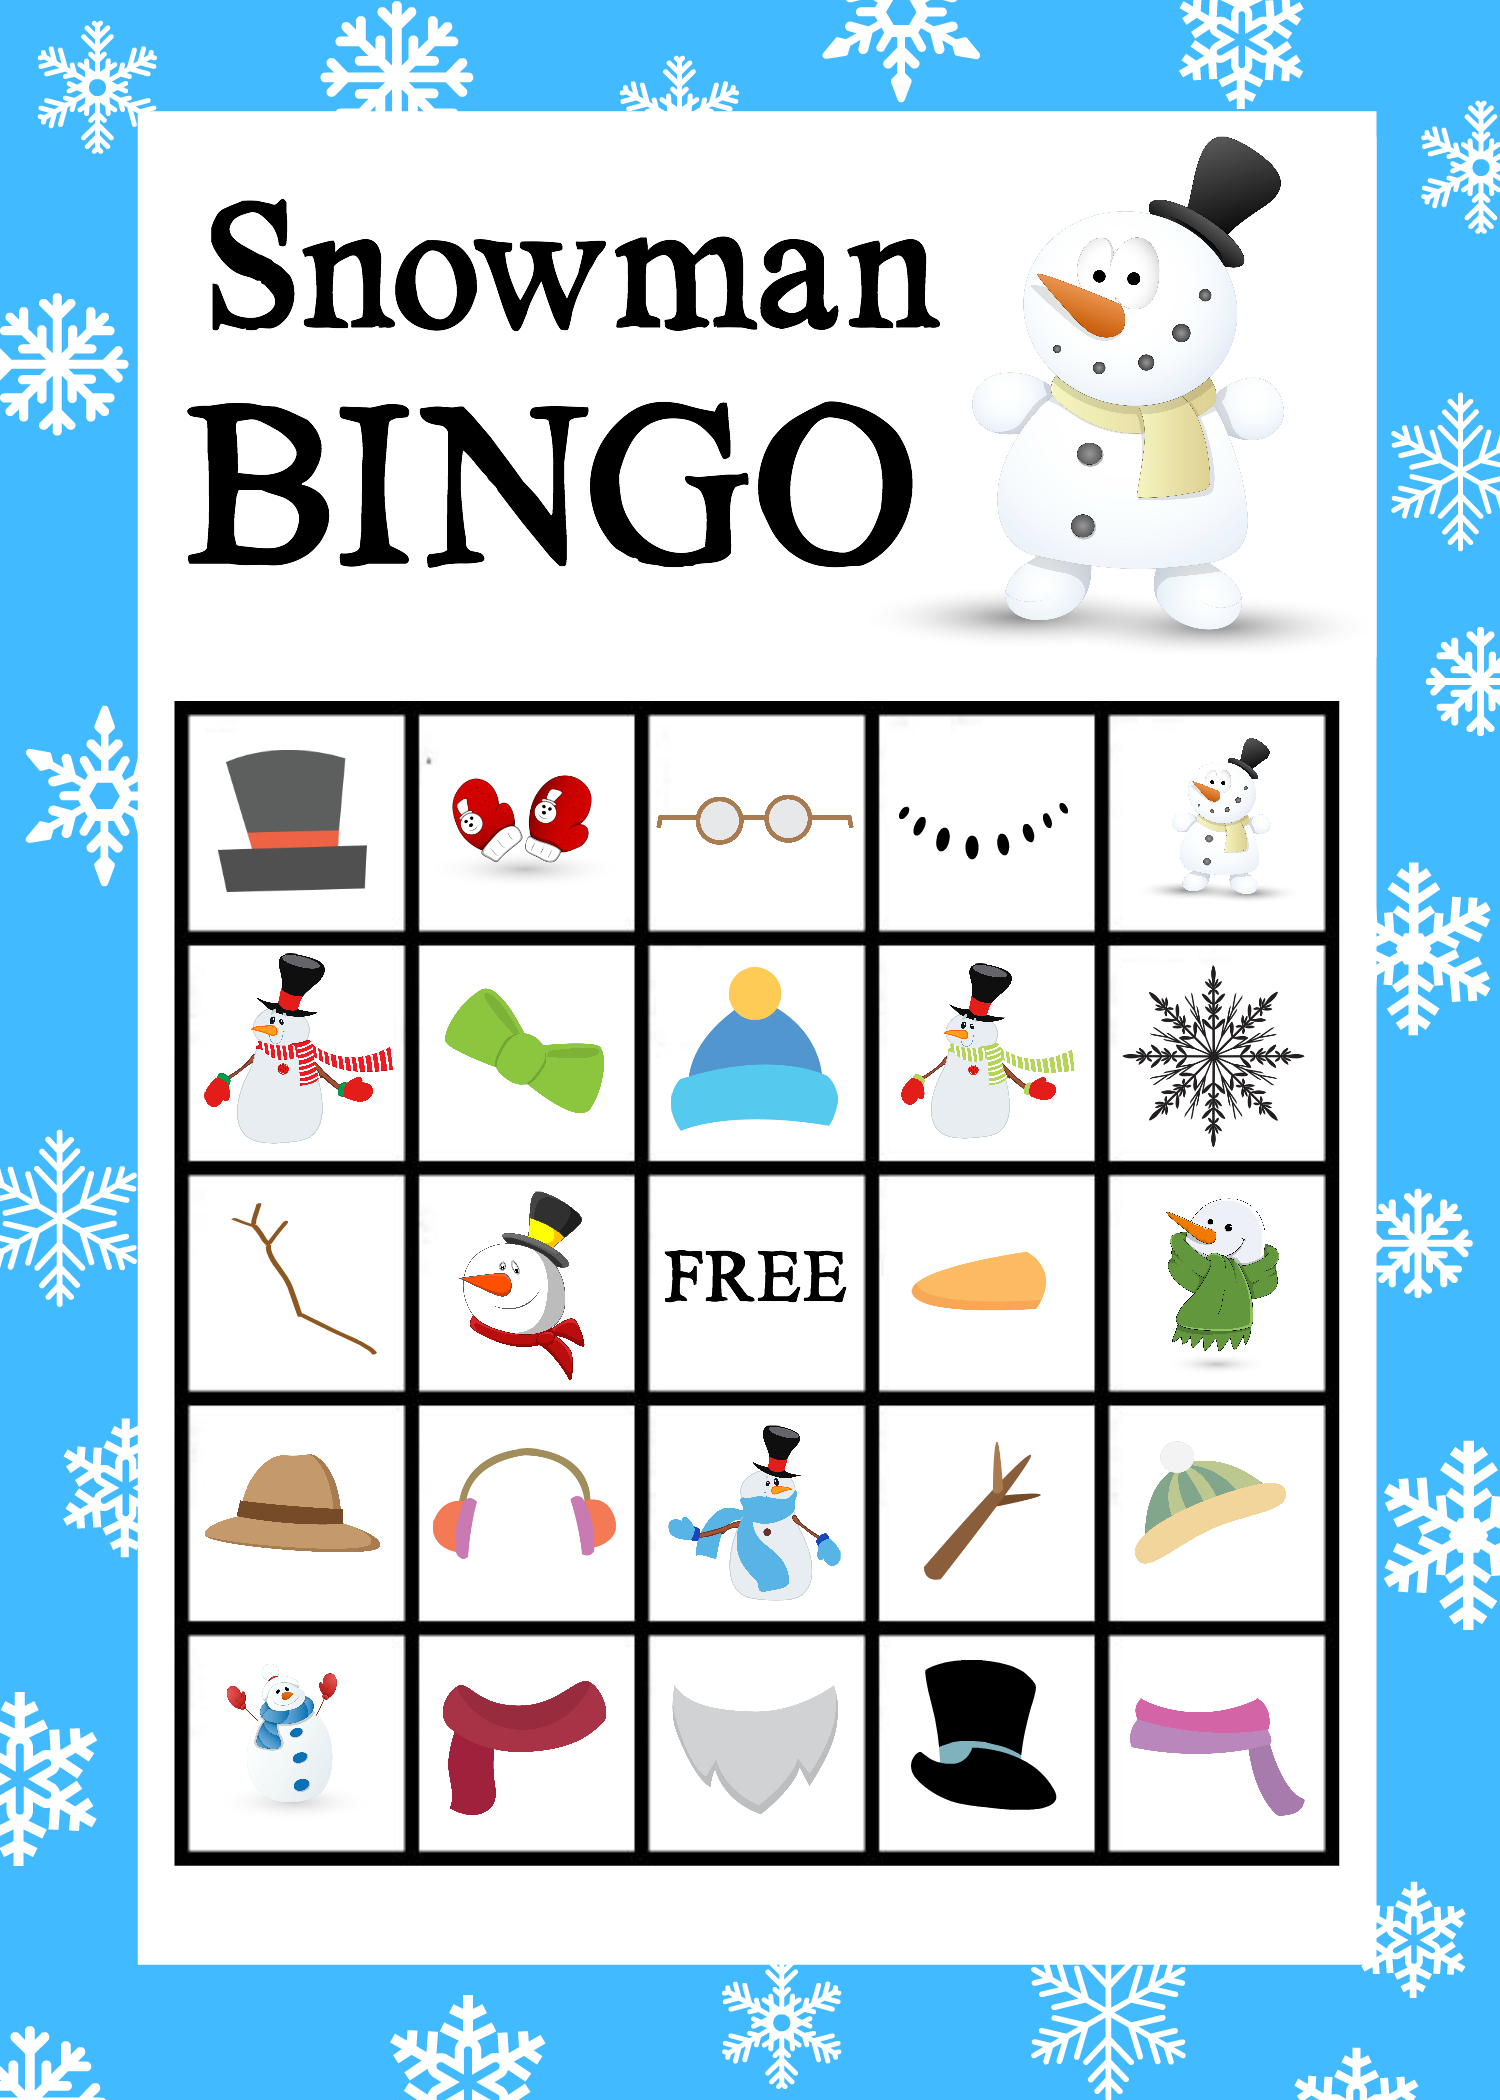 Printable Snowman Bingo Game   School Holiday Party, Snowman